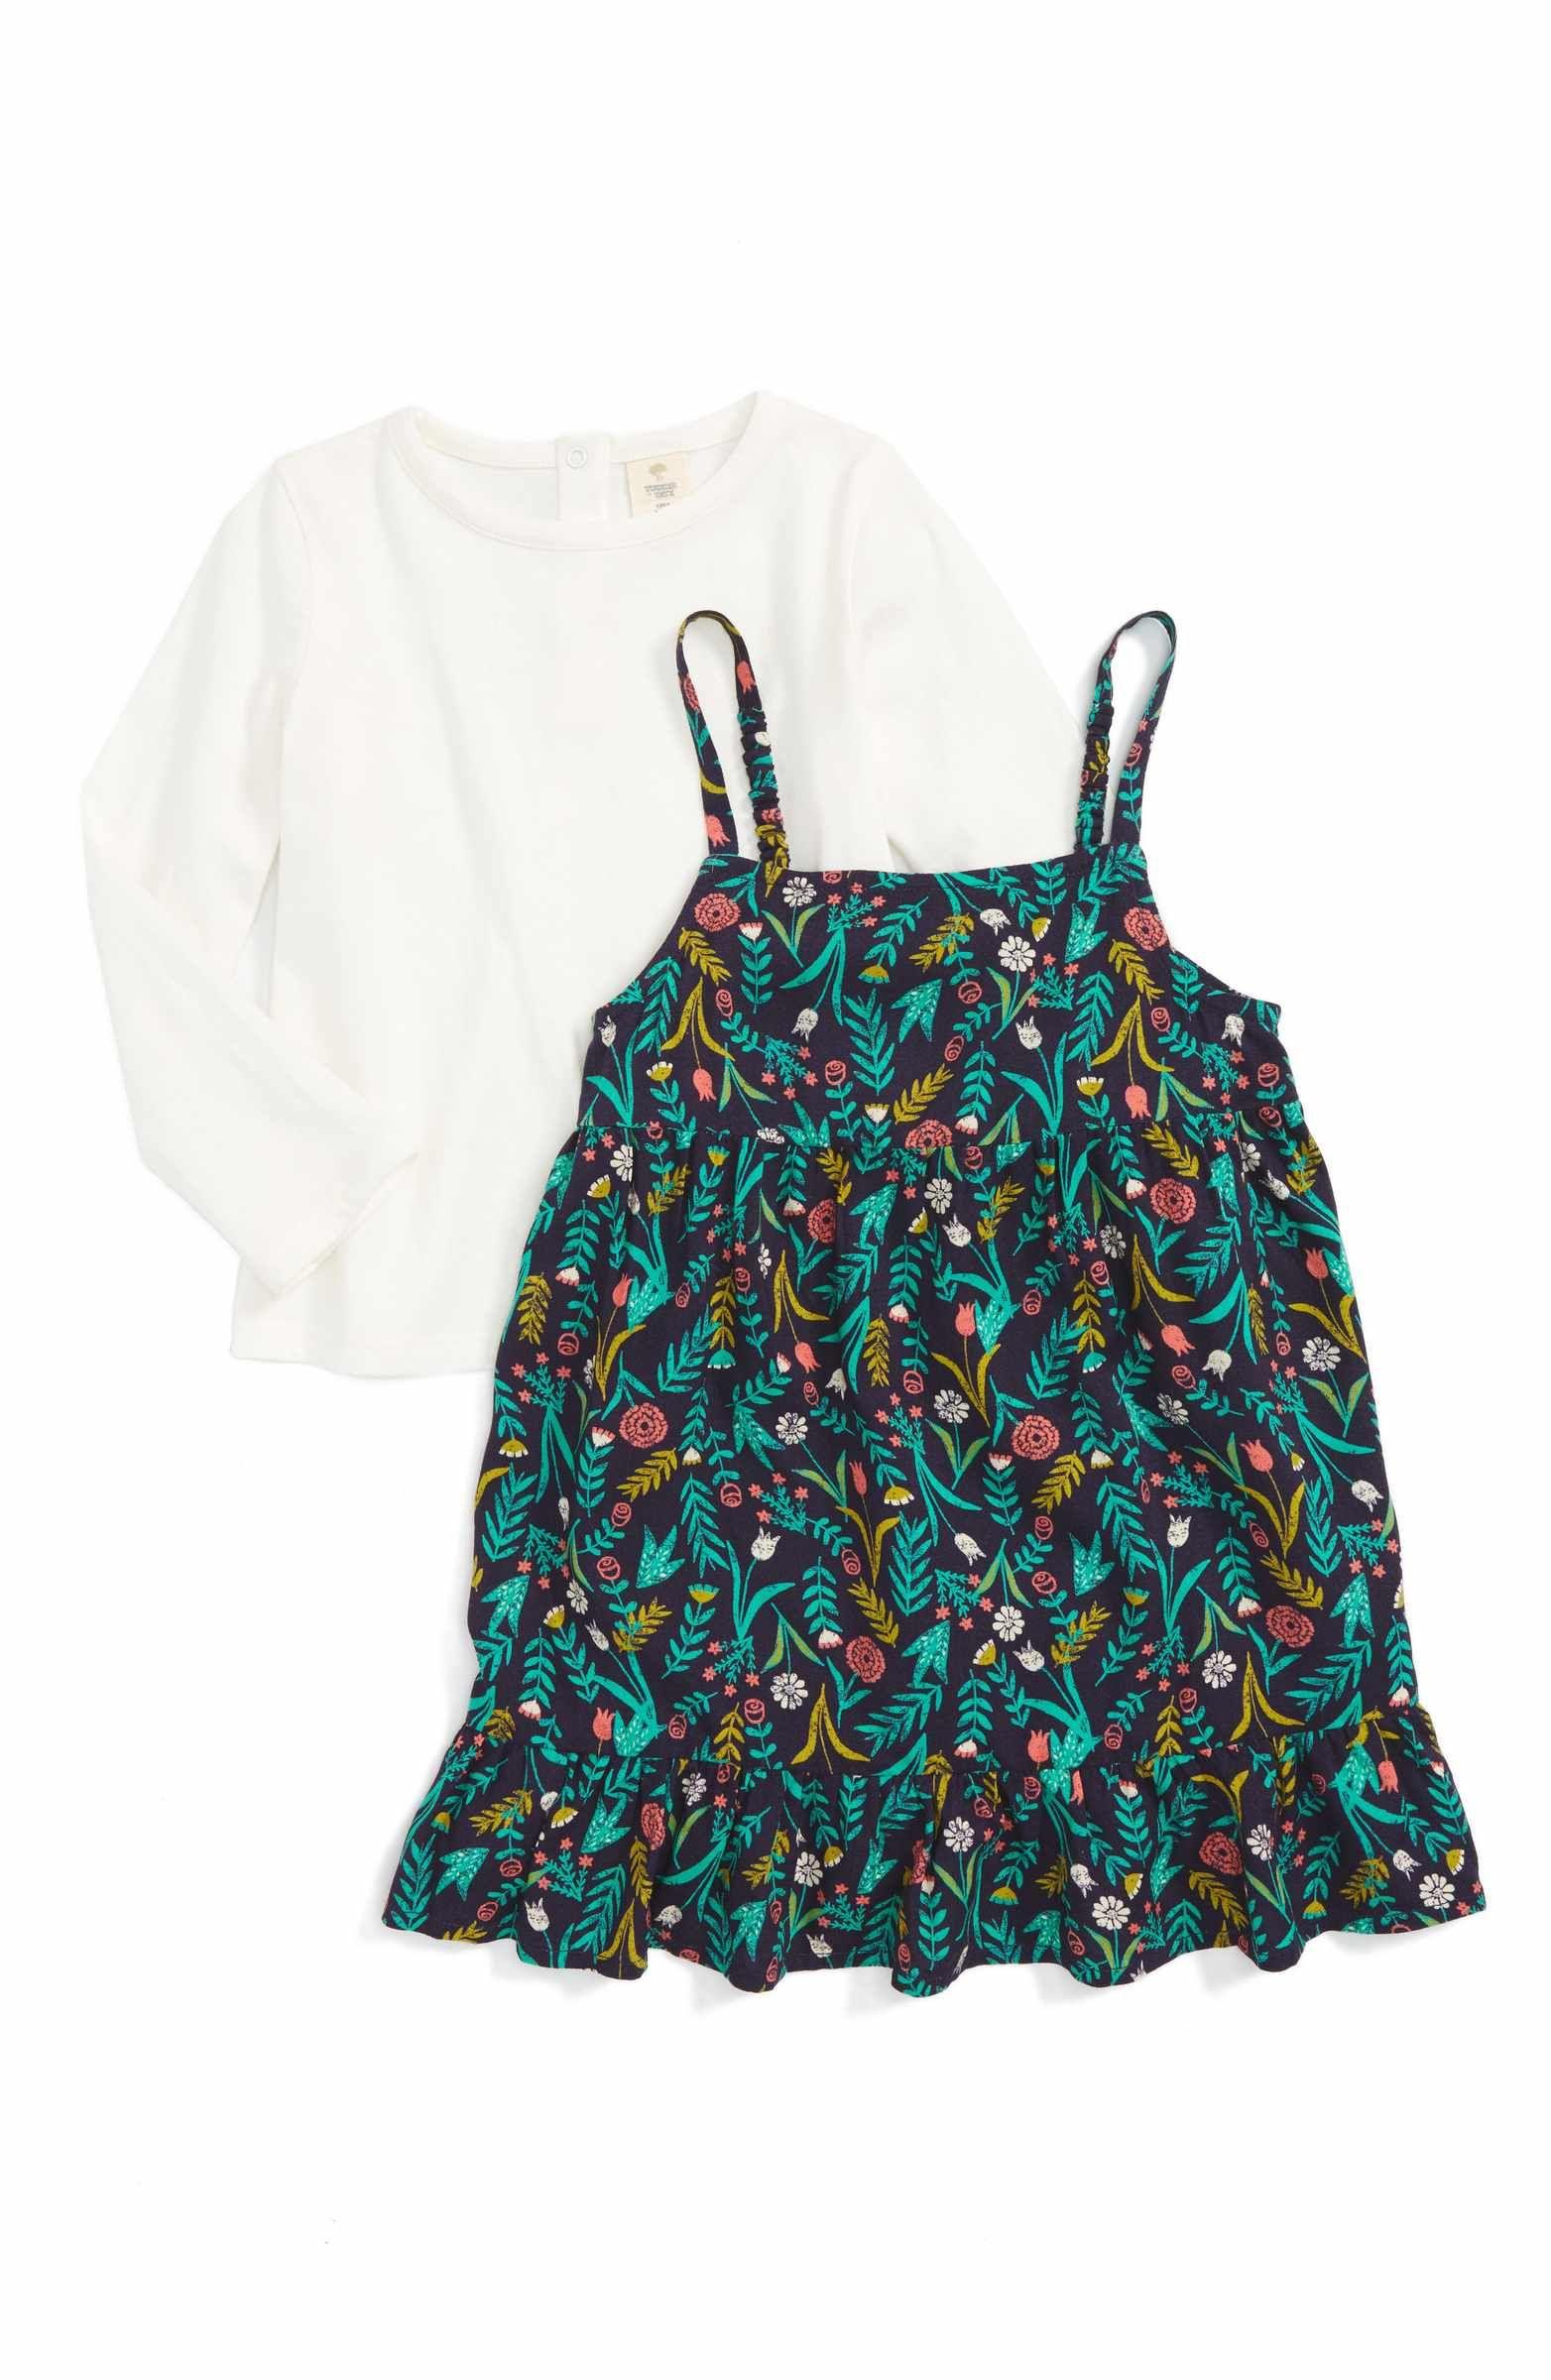 71fa1f92 Main Image - Tucker + Tate Dress & Tee Set (Baby Girls) | Barneklær ...